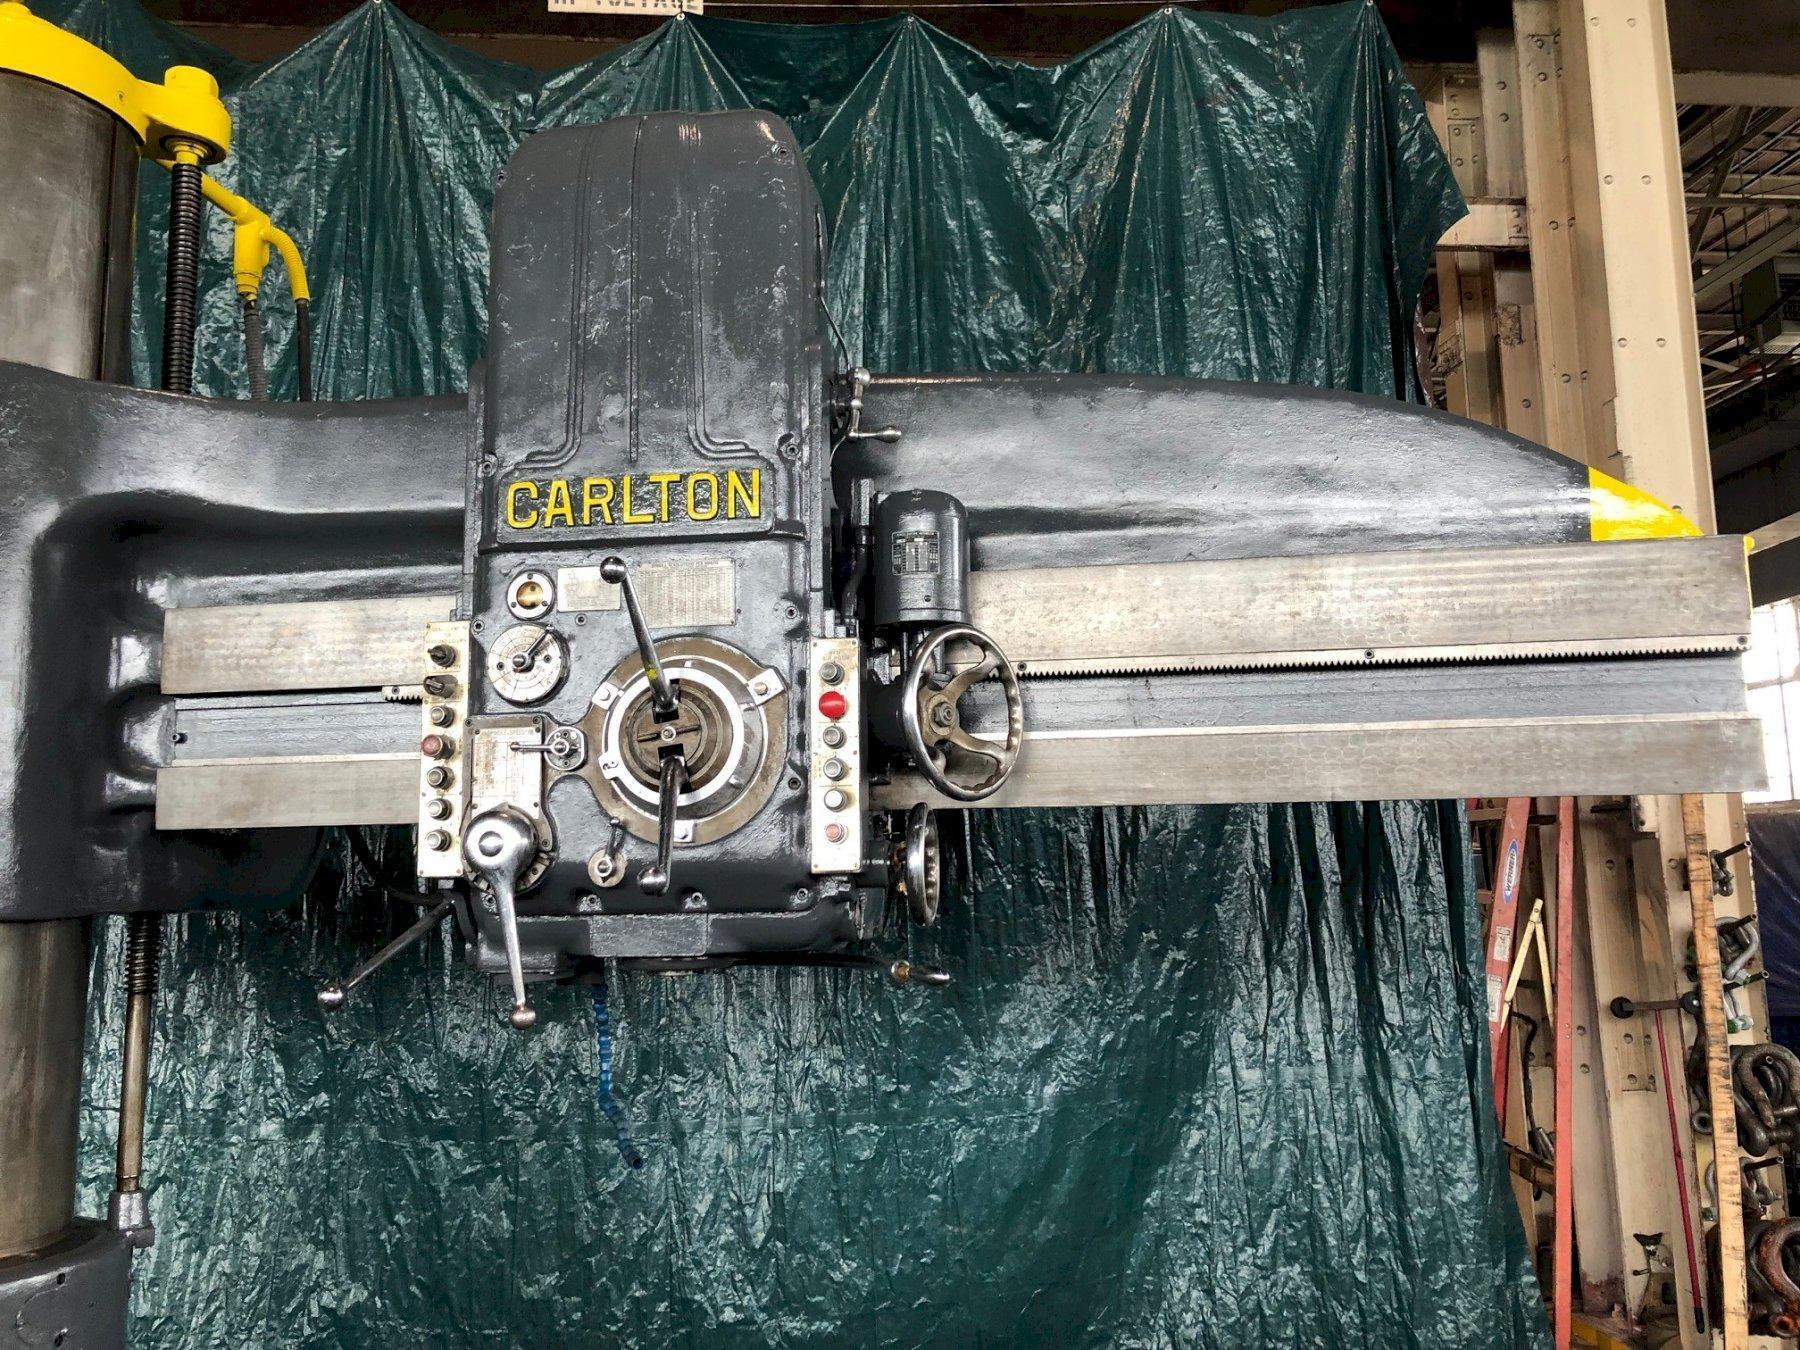 "8' X 19"" CARLTON RADIAL ARM DRILL. STOCK # 1019319"